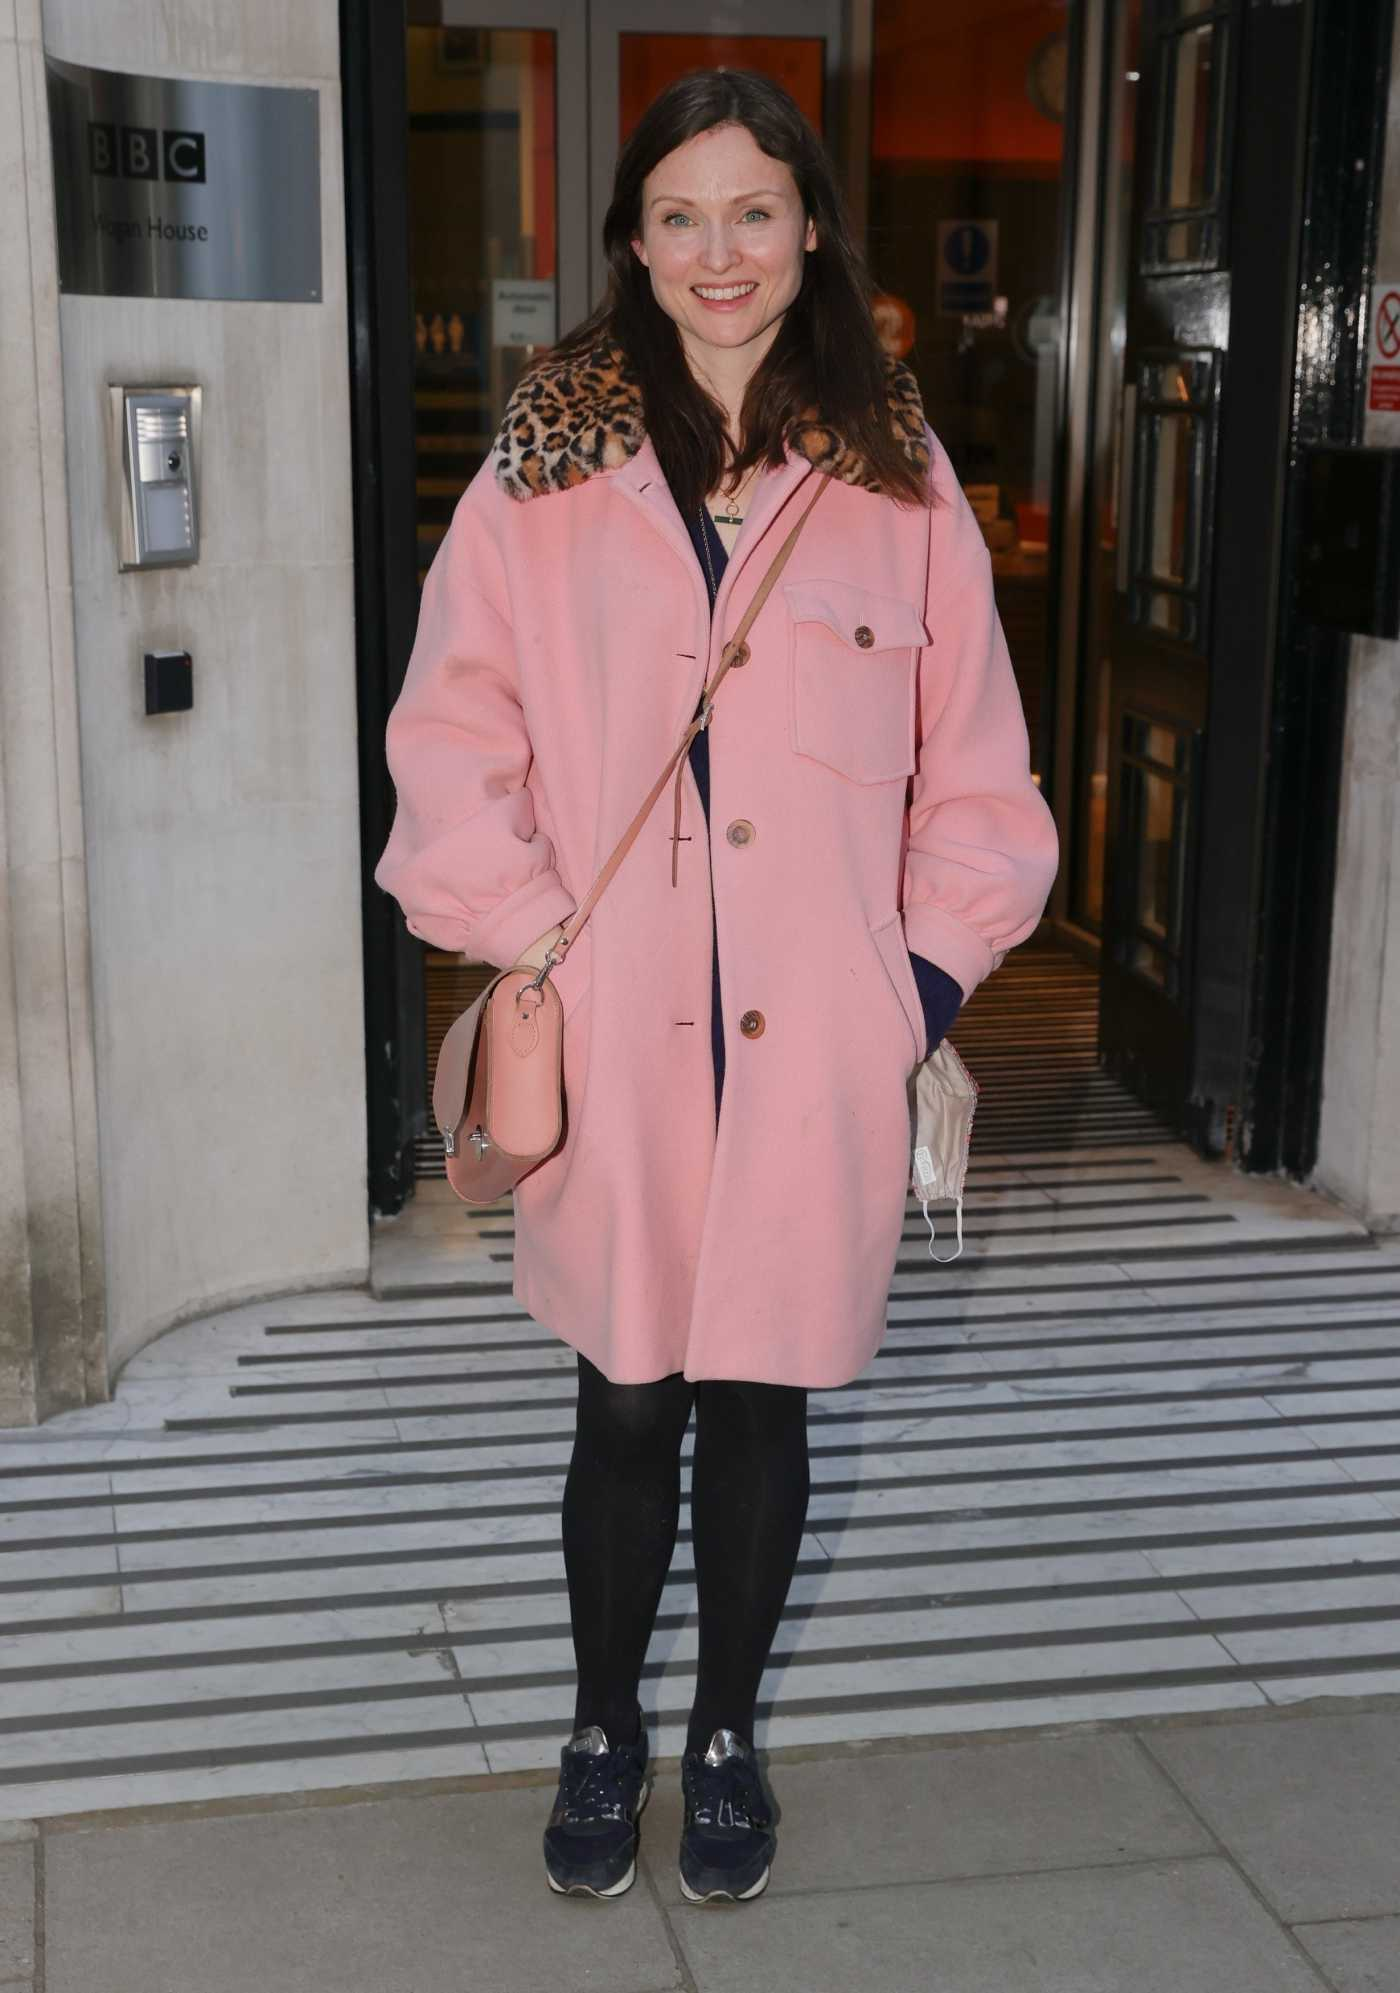 Sophie Ellis-Bextor in a Pink Coat Arrives at BBC Radio 2 in London 04/05/2021